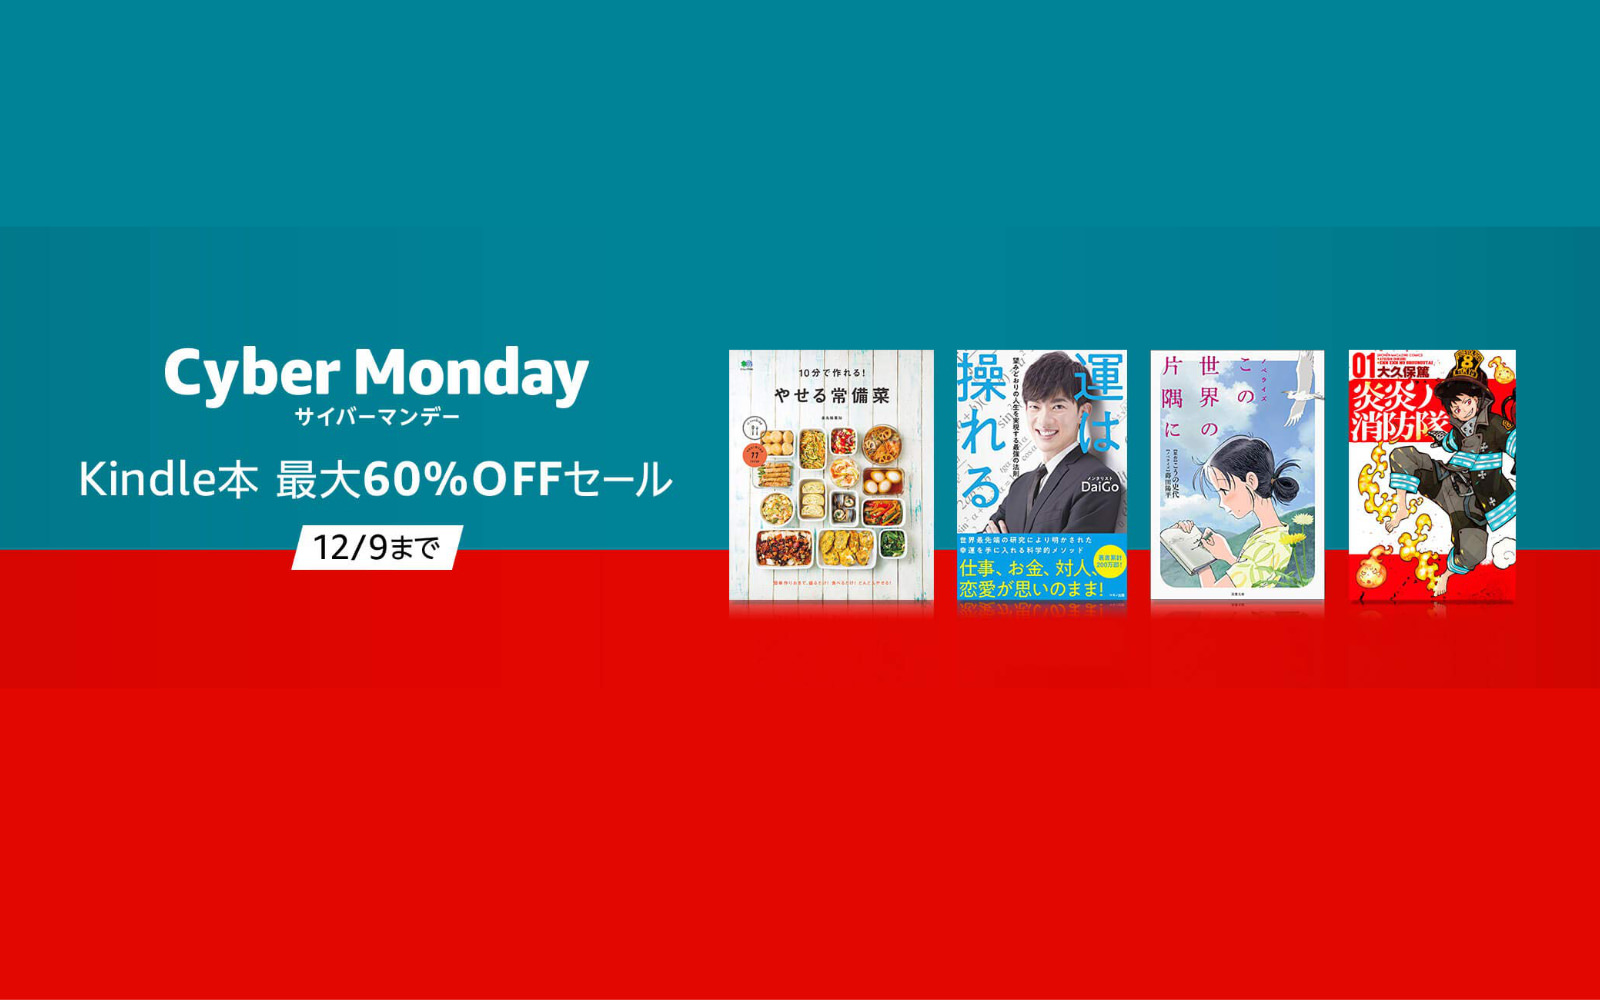 Cybermonday-kindle-sale.jpg